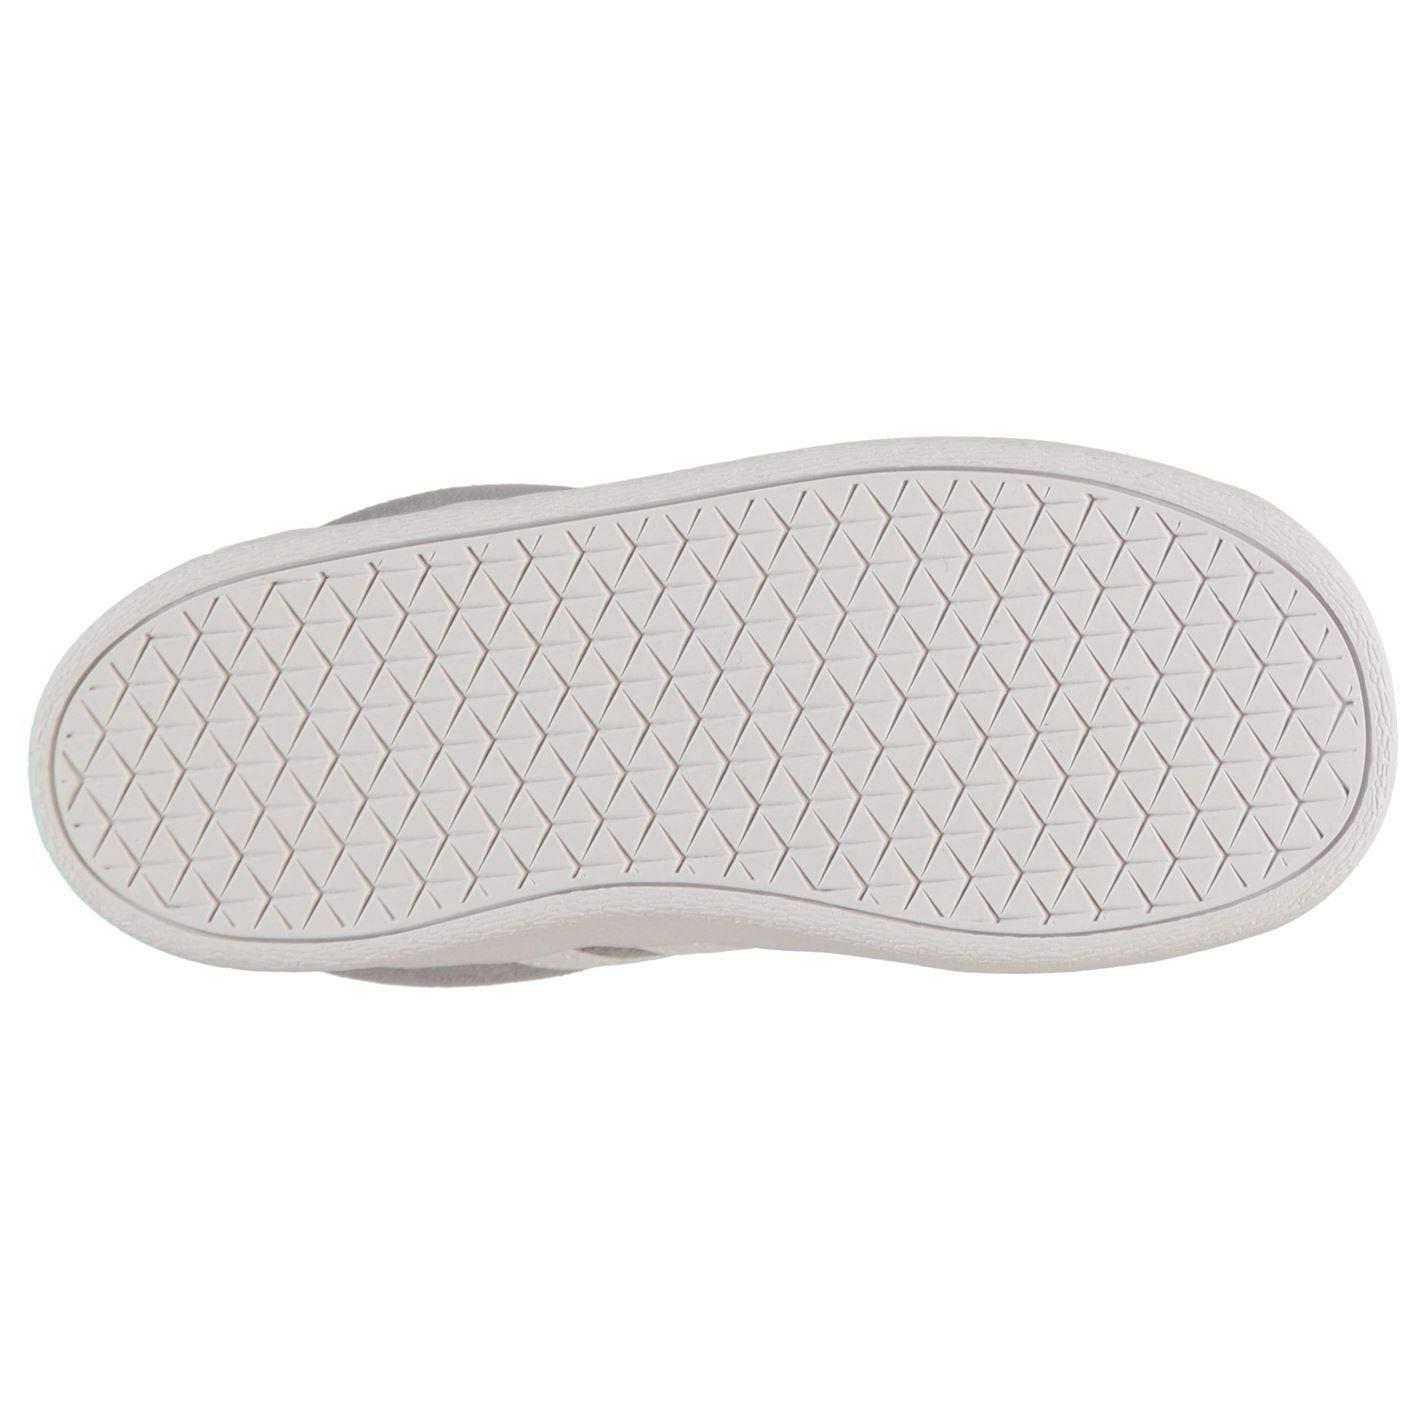 new product 7fa7e c6cdb adidas VL Court 2.0 Cmf, Scarpe da Tennis Unisex - Bambini  Amazon.it   Scarpe e borse